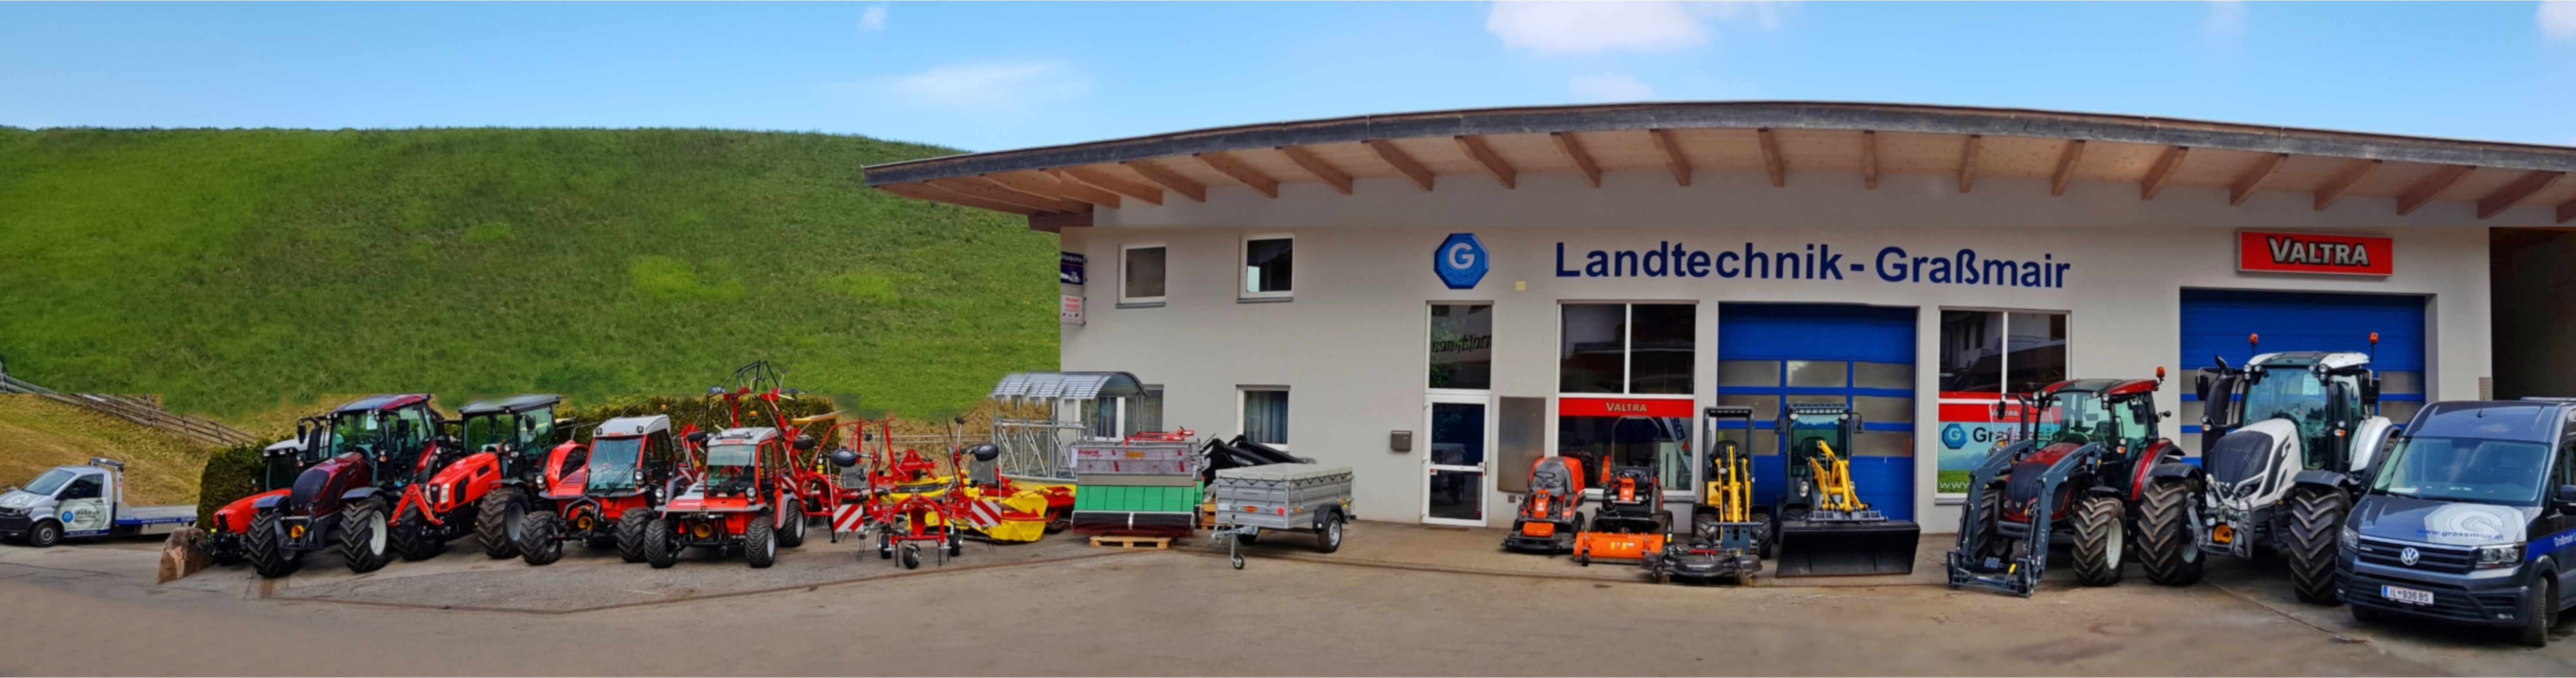 Graßmair Landtechnik-Schlosserei in Rinn